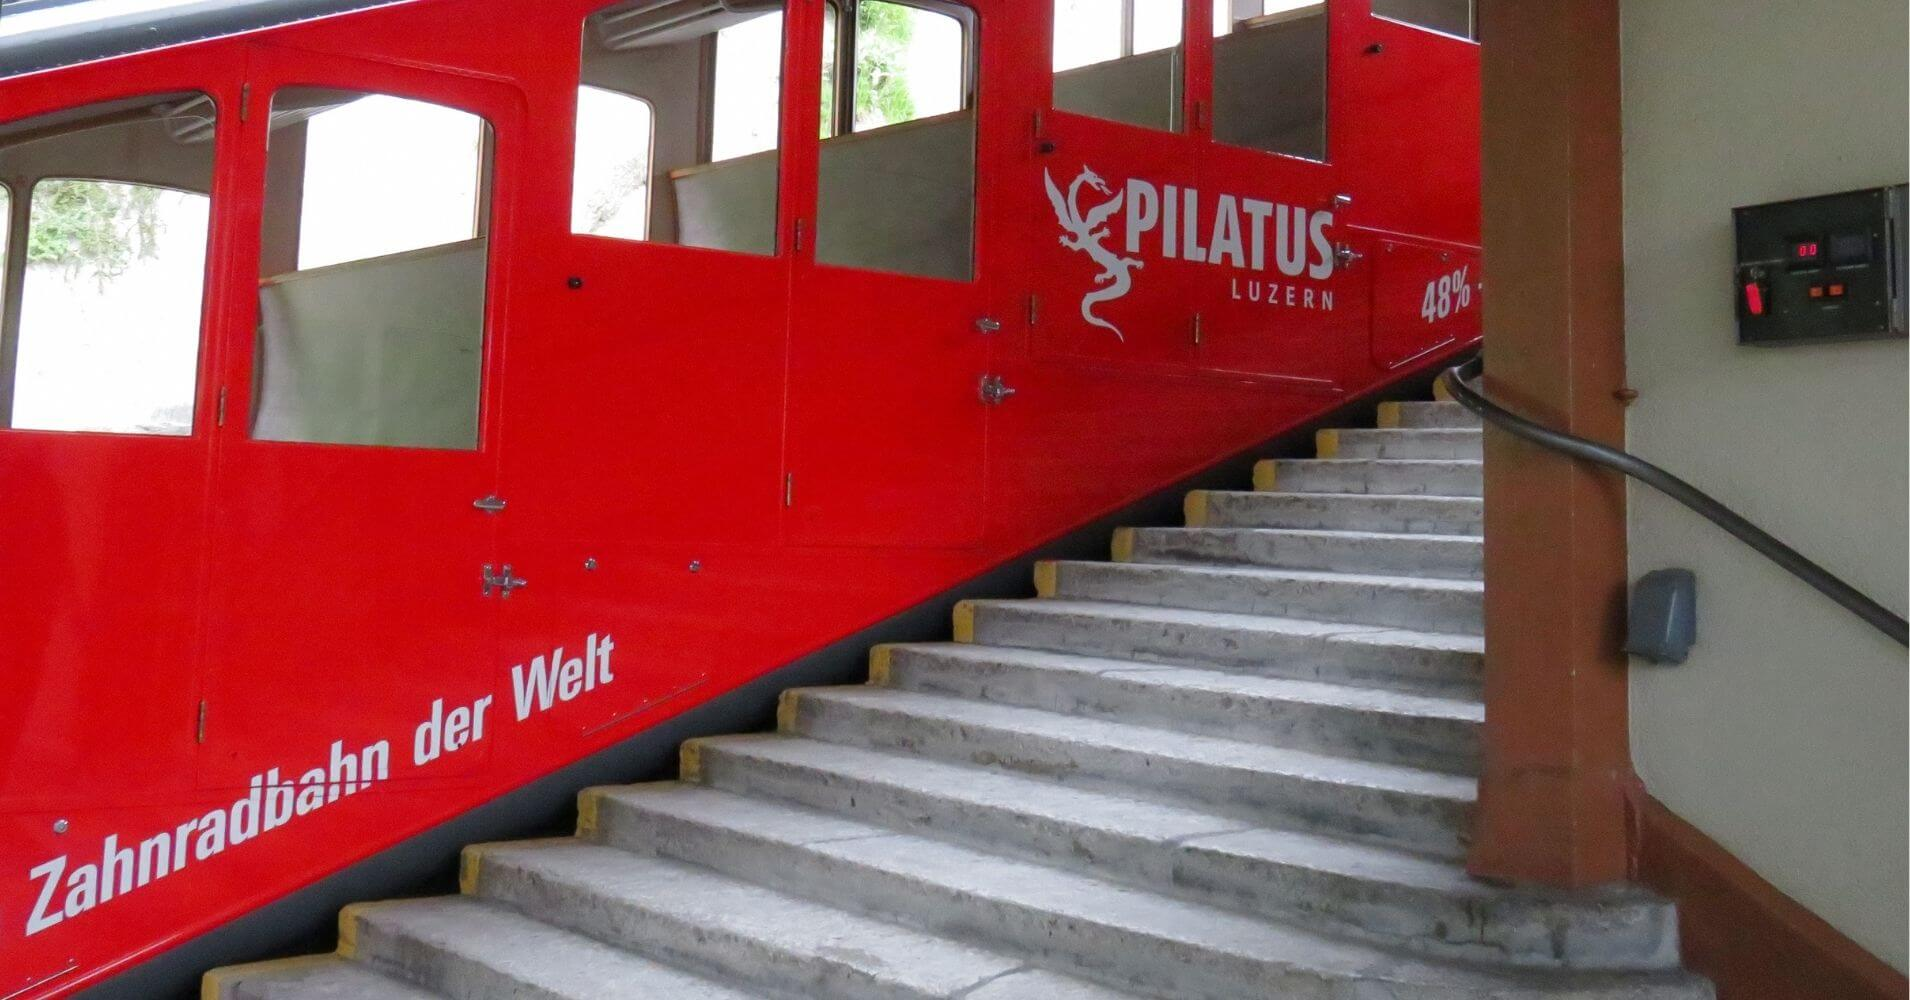 El Tren de Cremallera Monte Pilatus. Suiza.